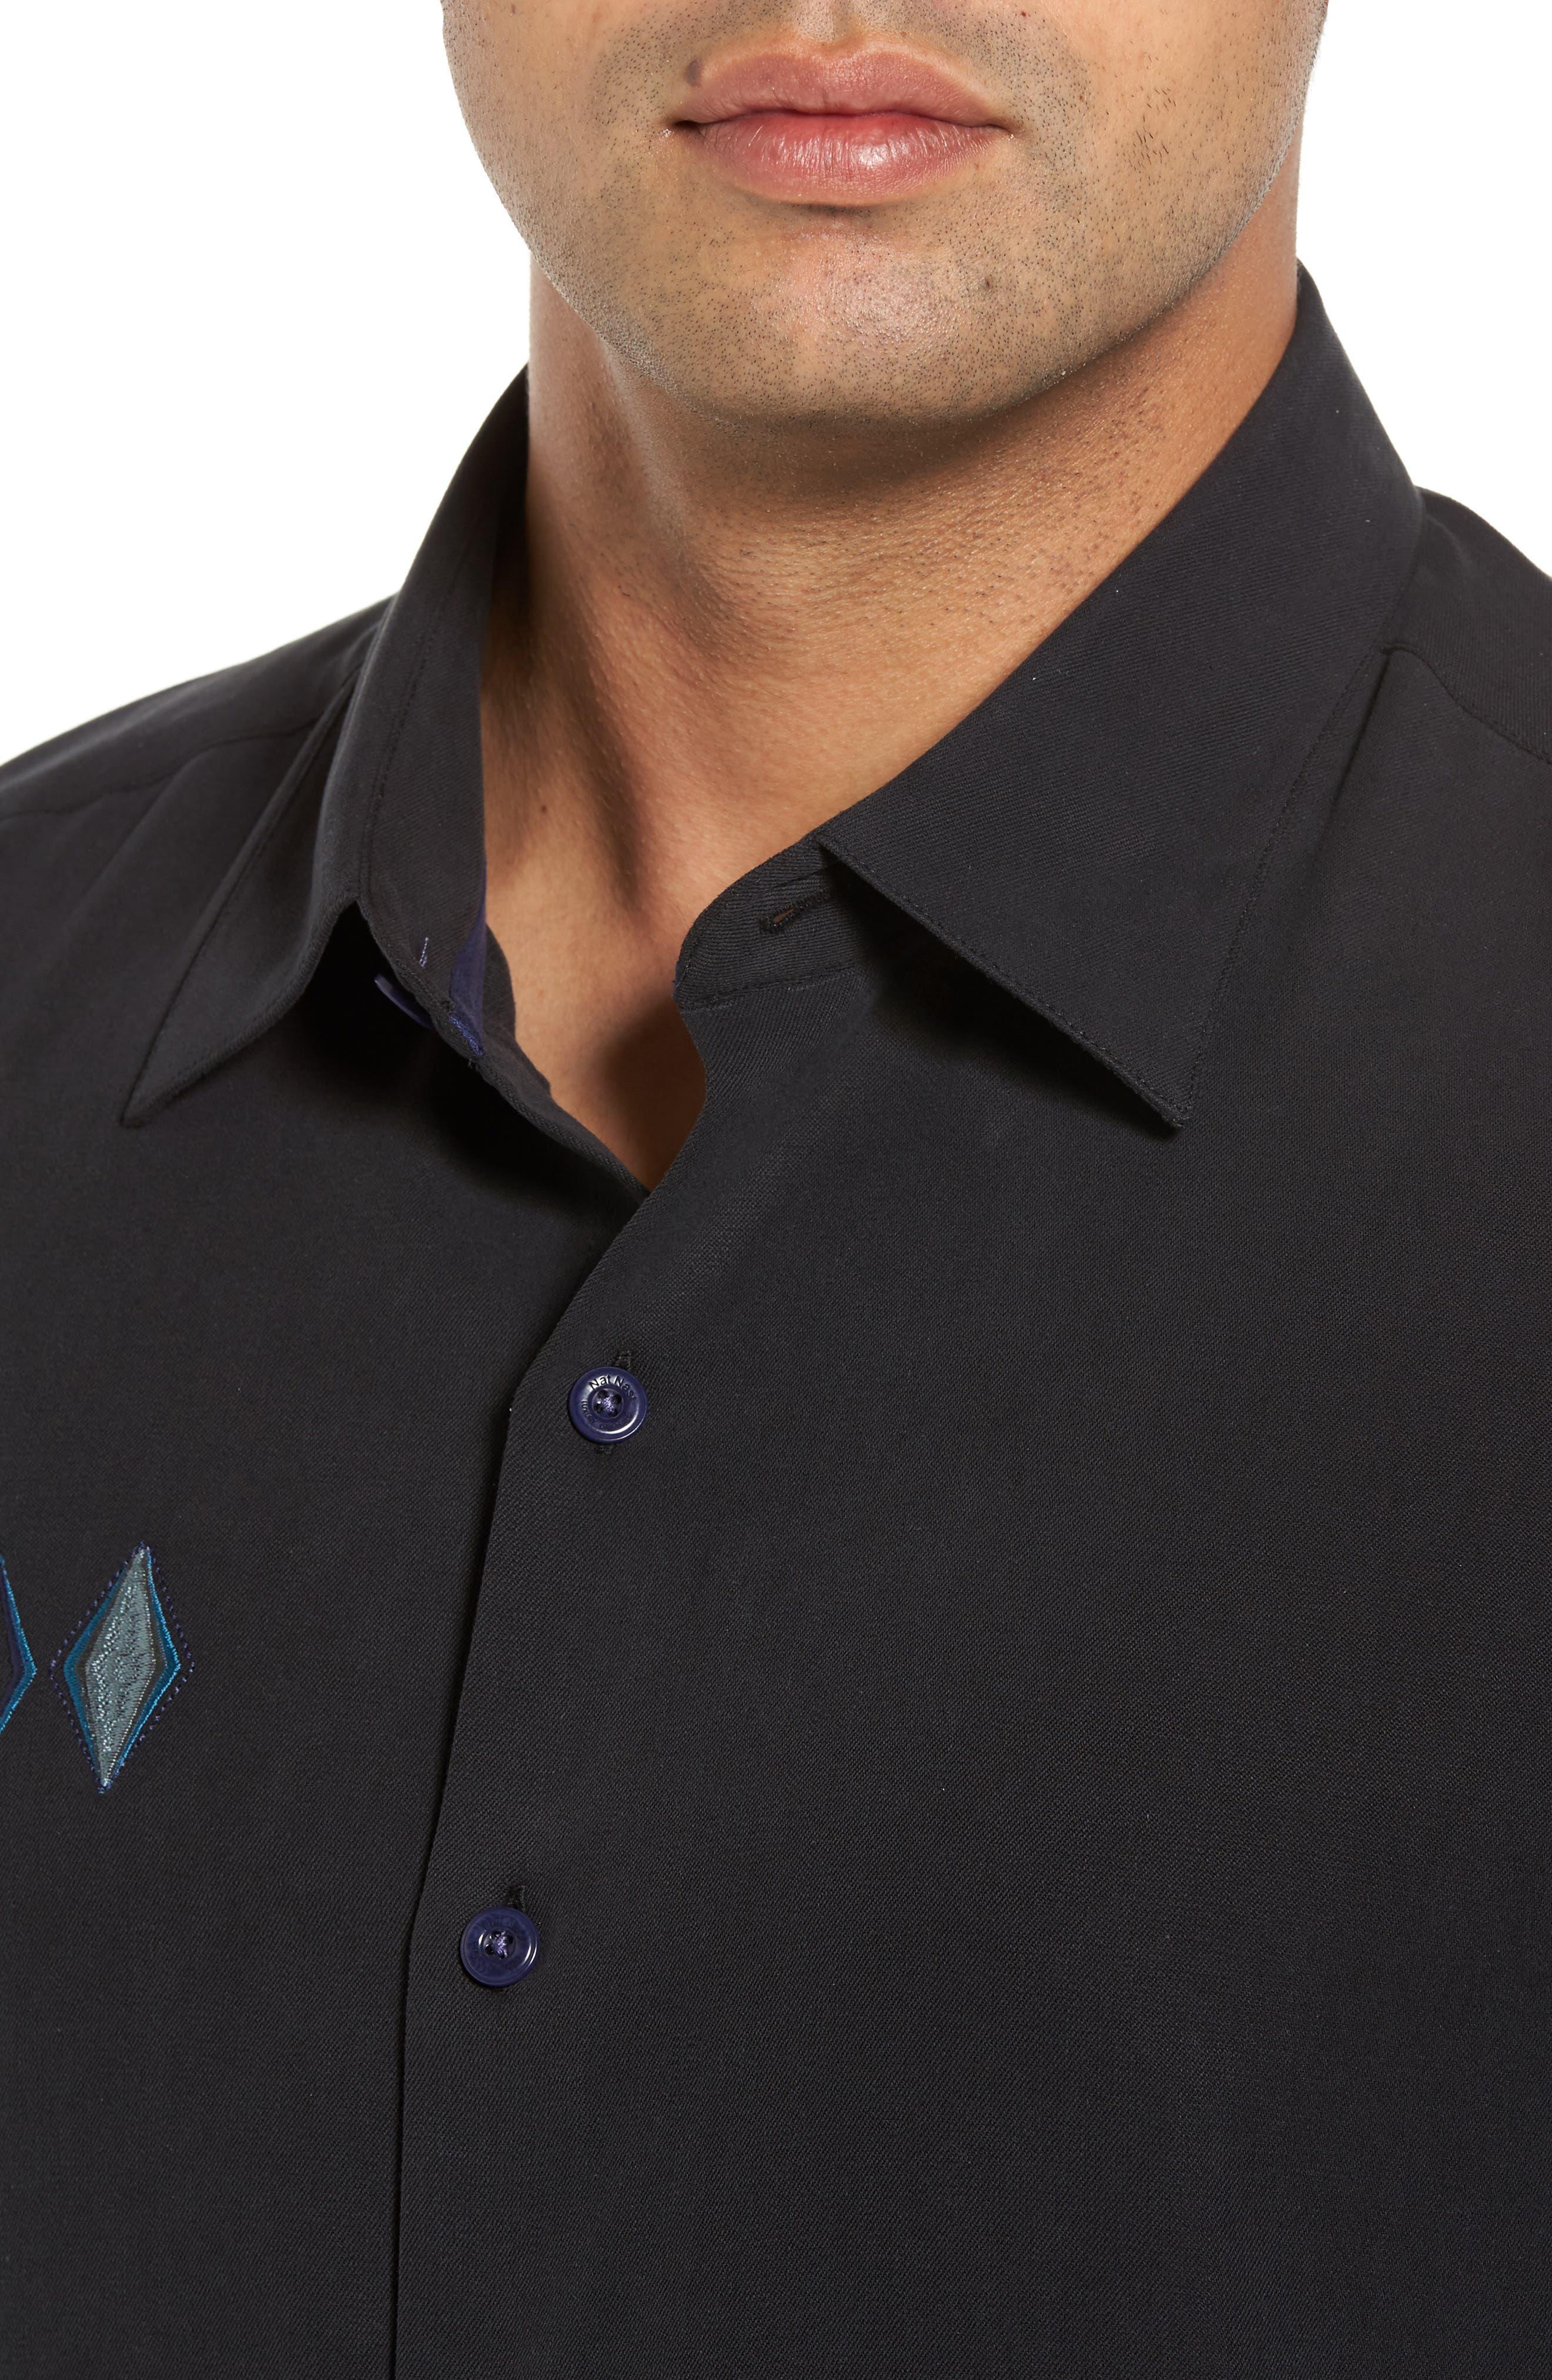 Black Diamond Regular Fit Embroidered Silk Blend Sport Shirt,                             Alternate thumbnail 4, color,                             Black